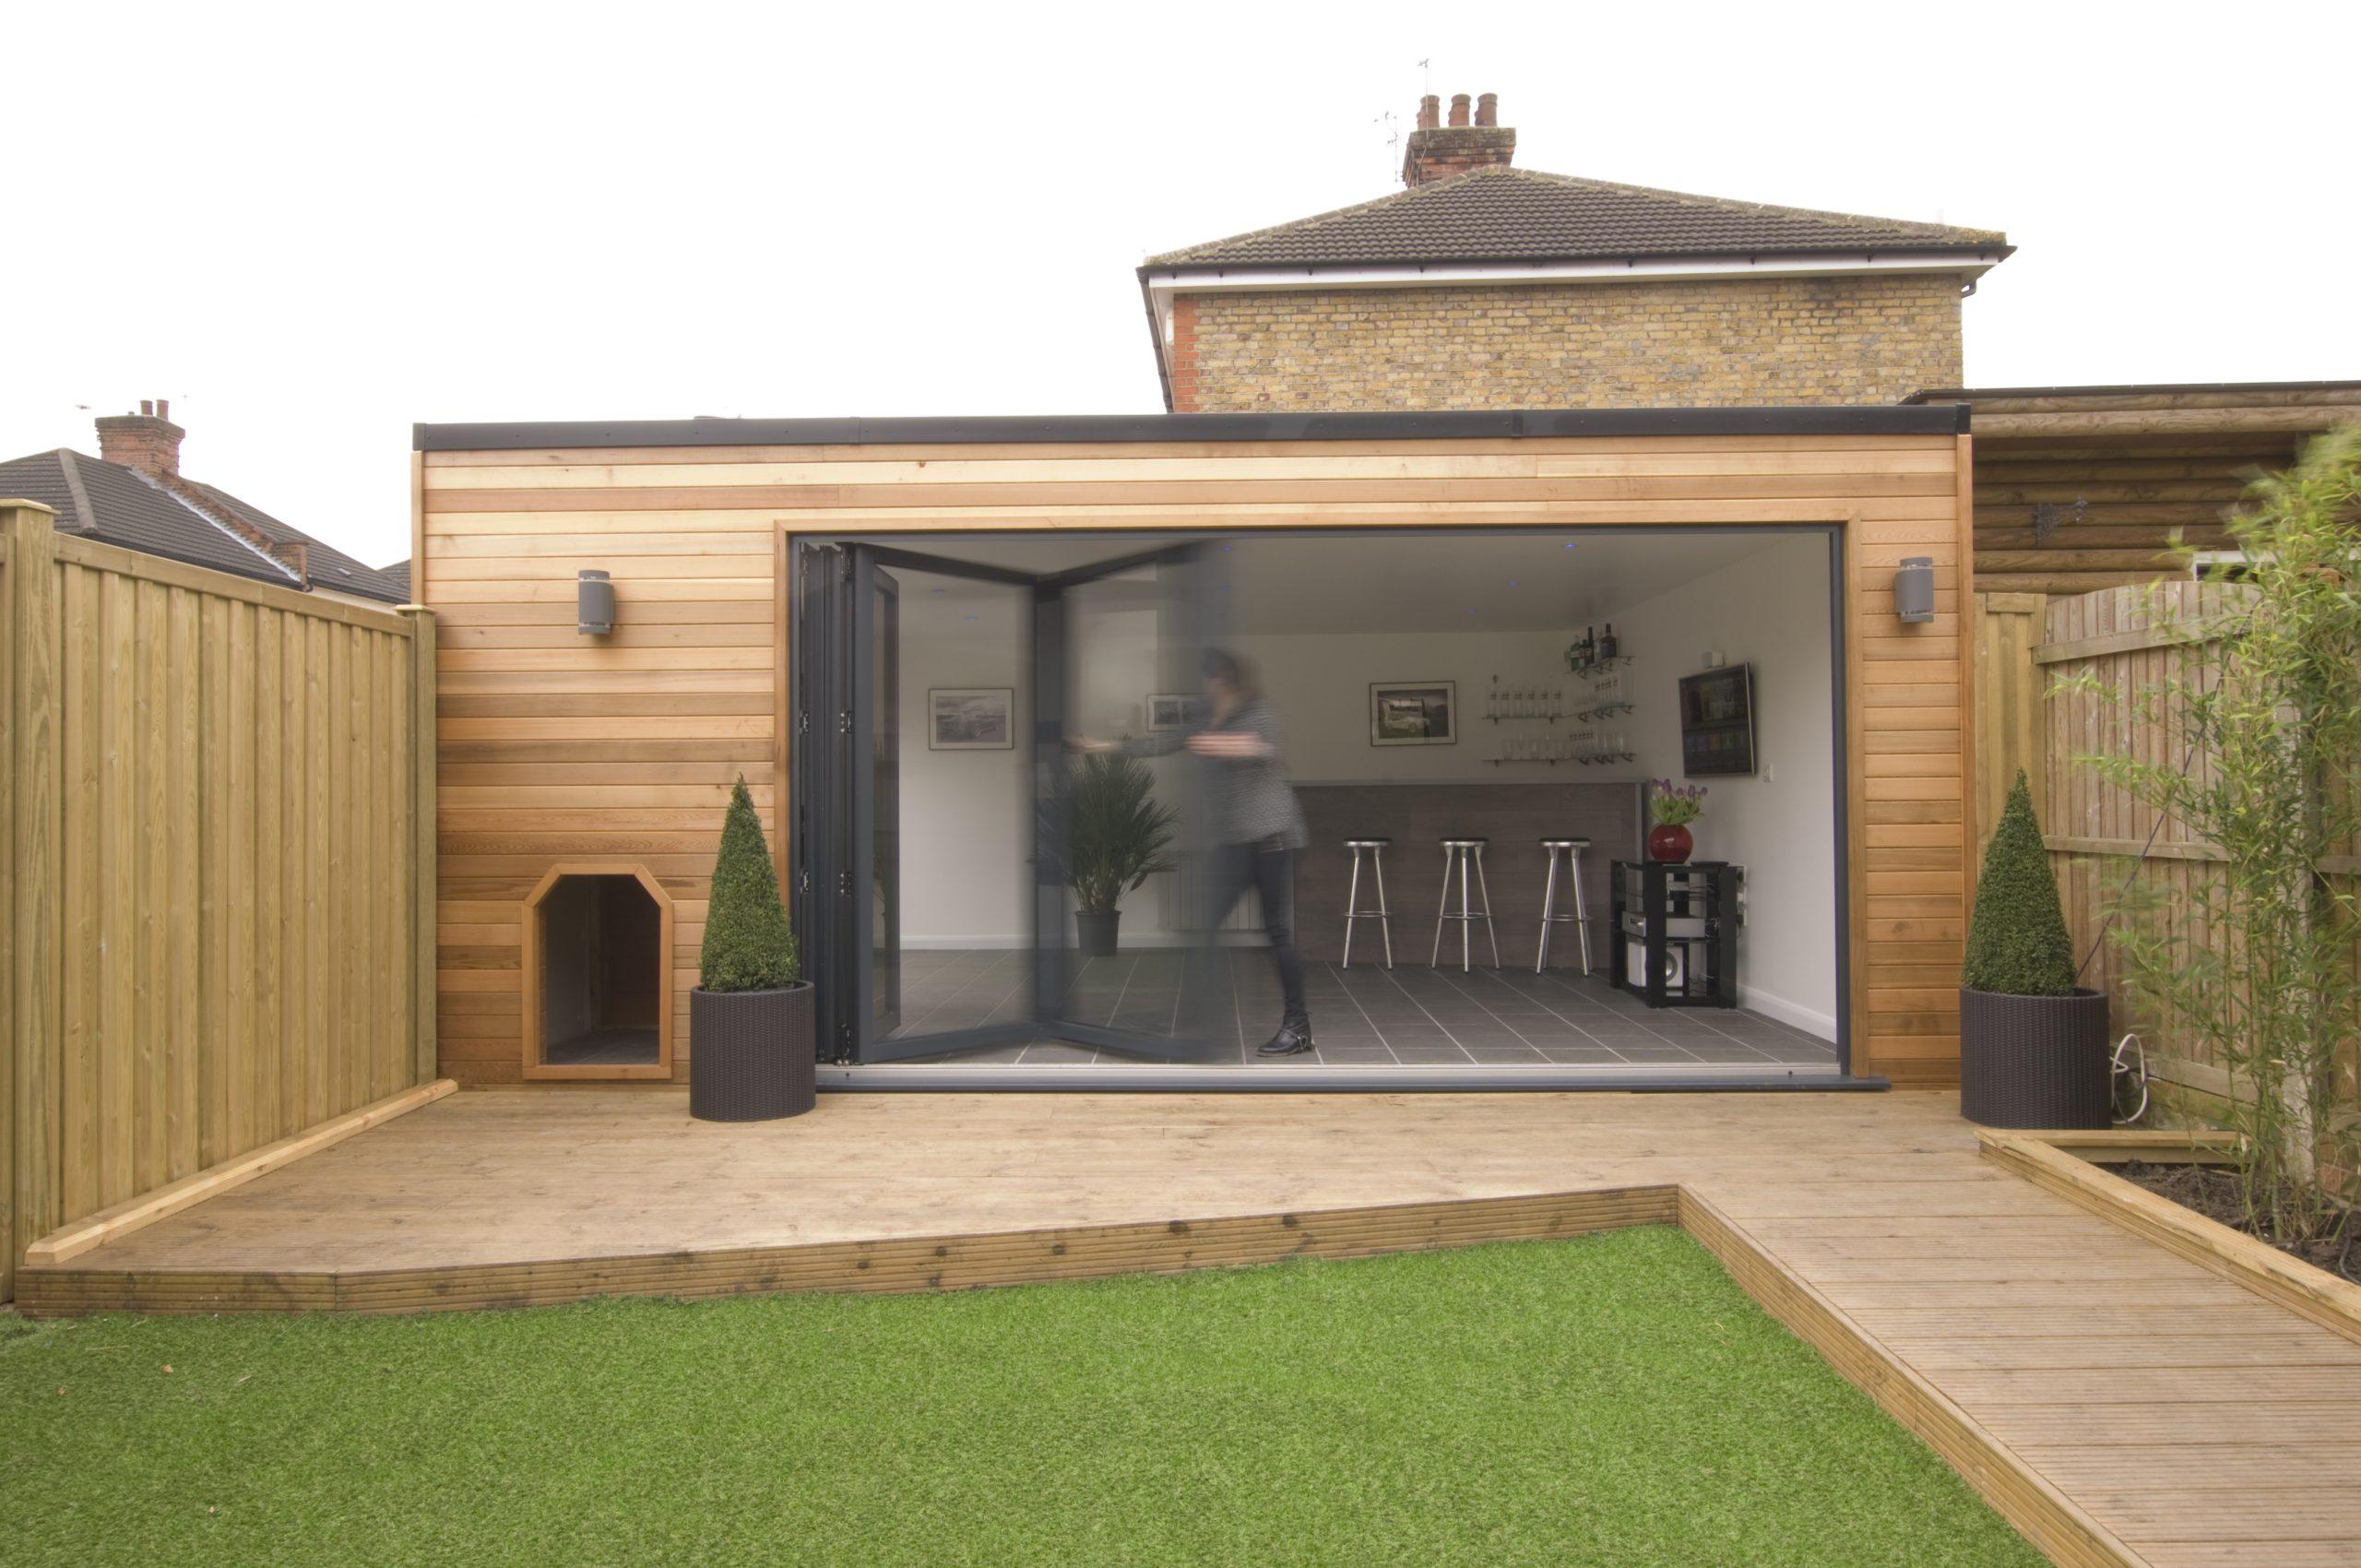 Pro Arkitects- Design & Build Experts - Architectural Design, Planning Application, Quantity Surveying, Project Management, Construction - Rear Extension - Conversion - Professional - Loft Conversion - Garage Conversion